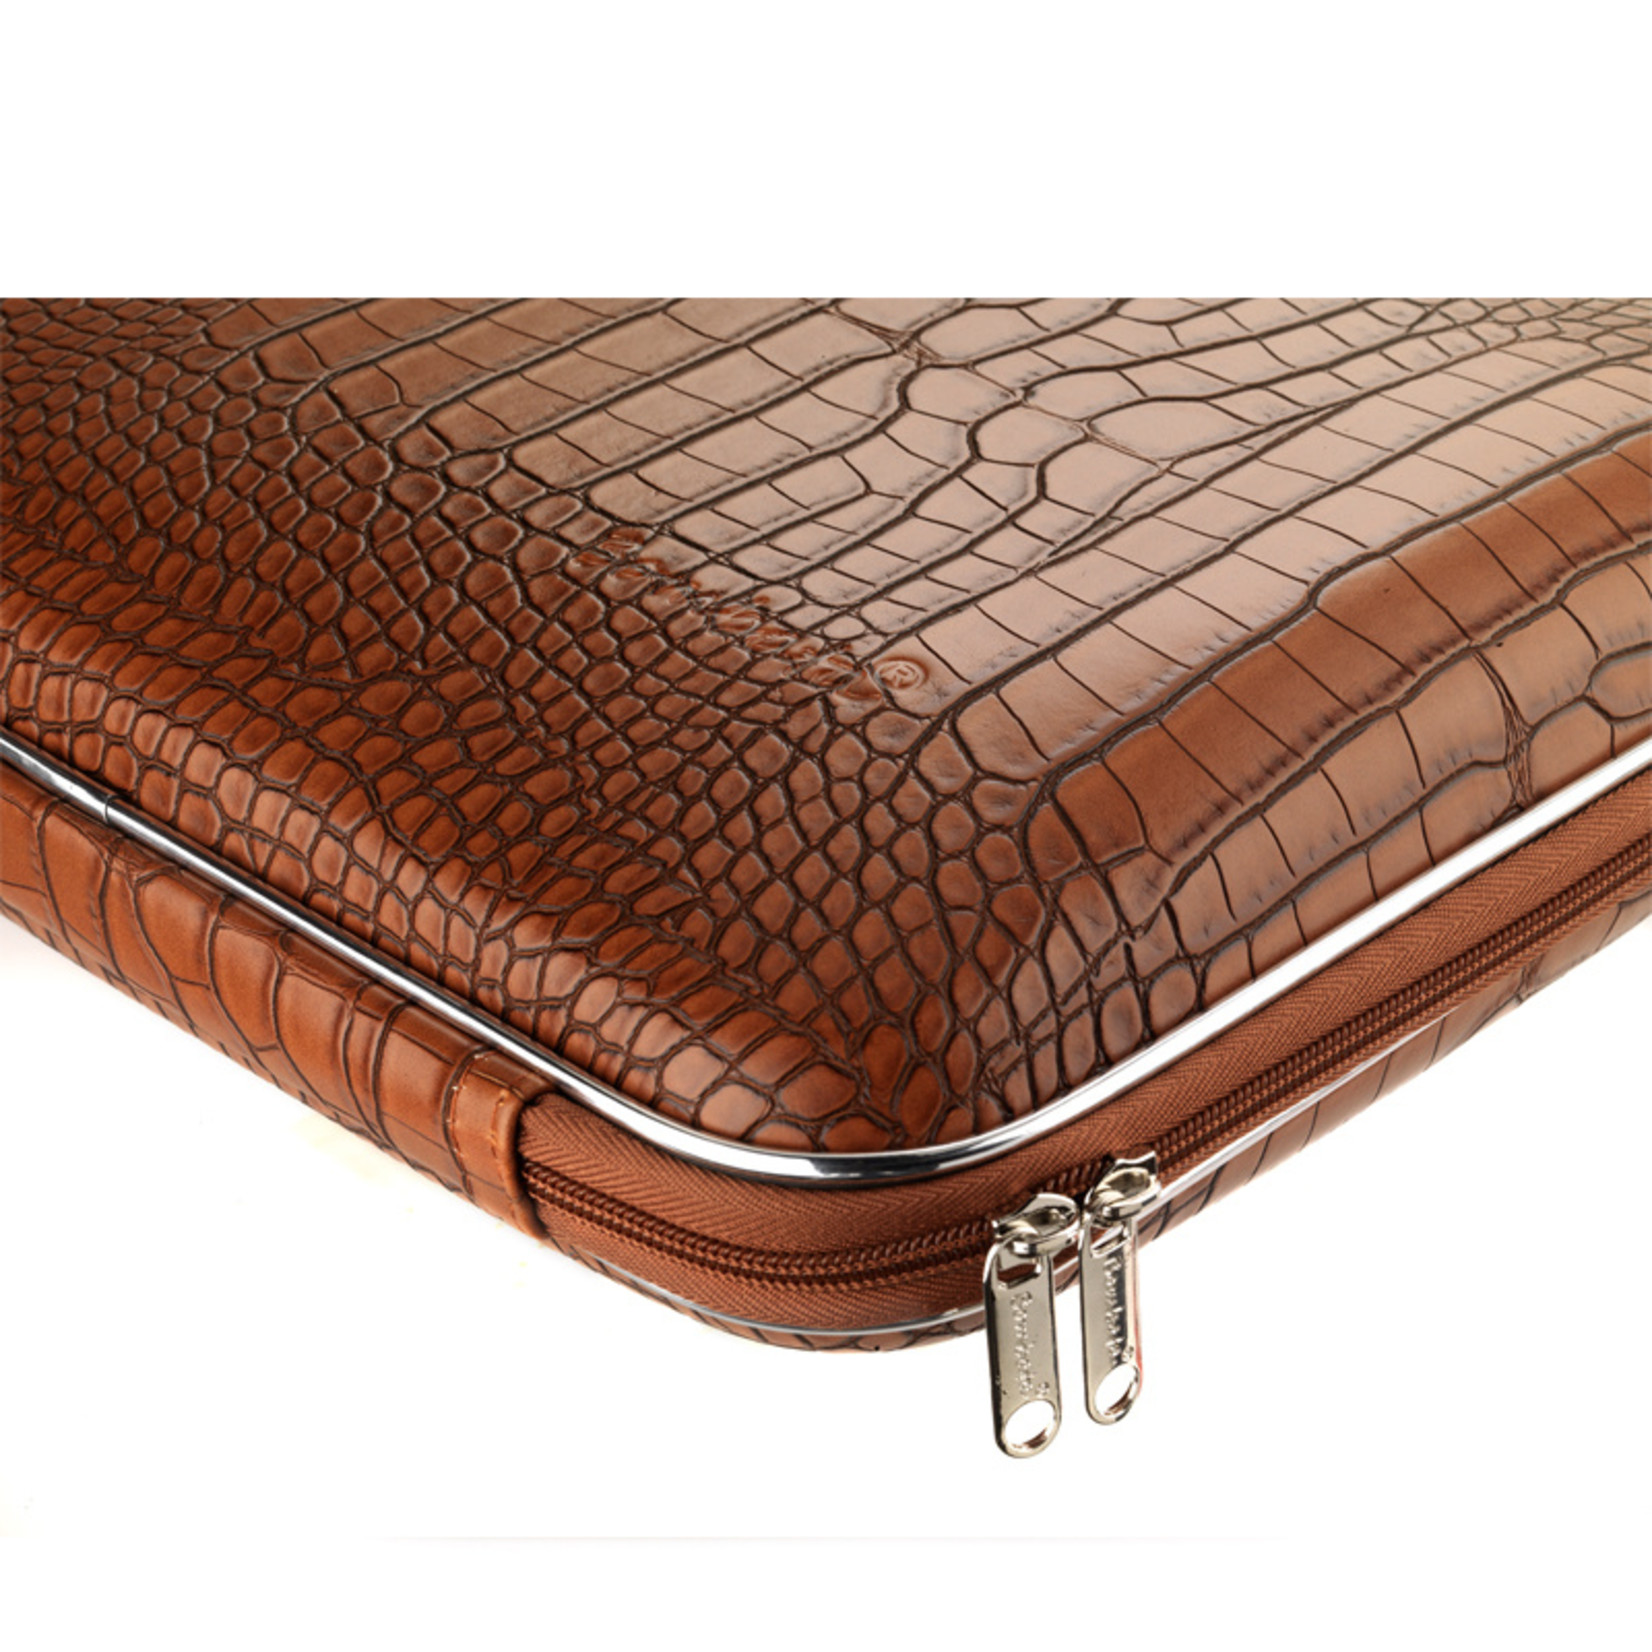 "Bombata Taschen Laptoptasche 15,6"" I Bombata Shiny Cocco I Notebooktasche weinrot"